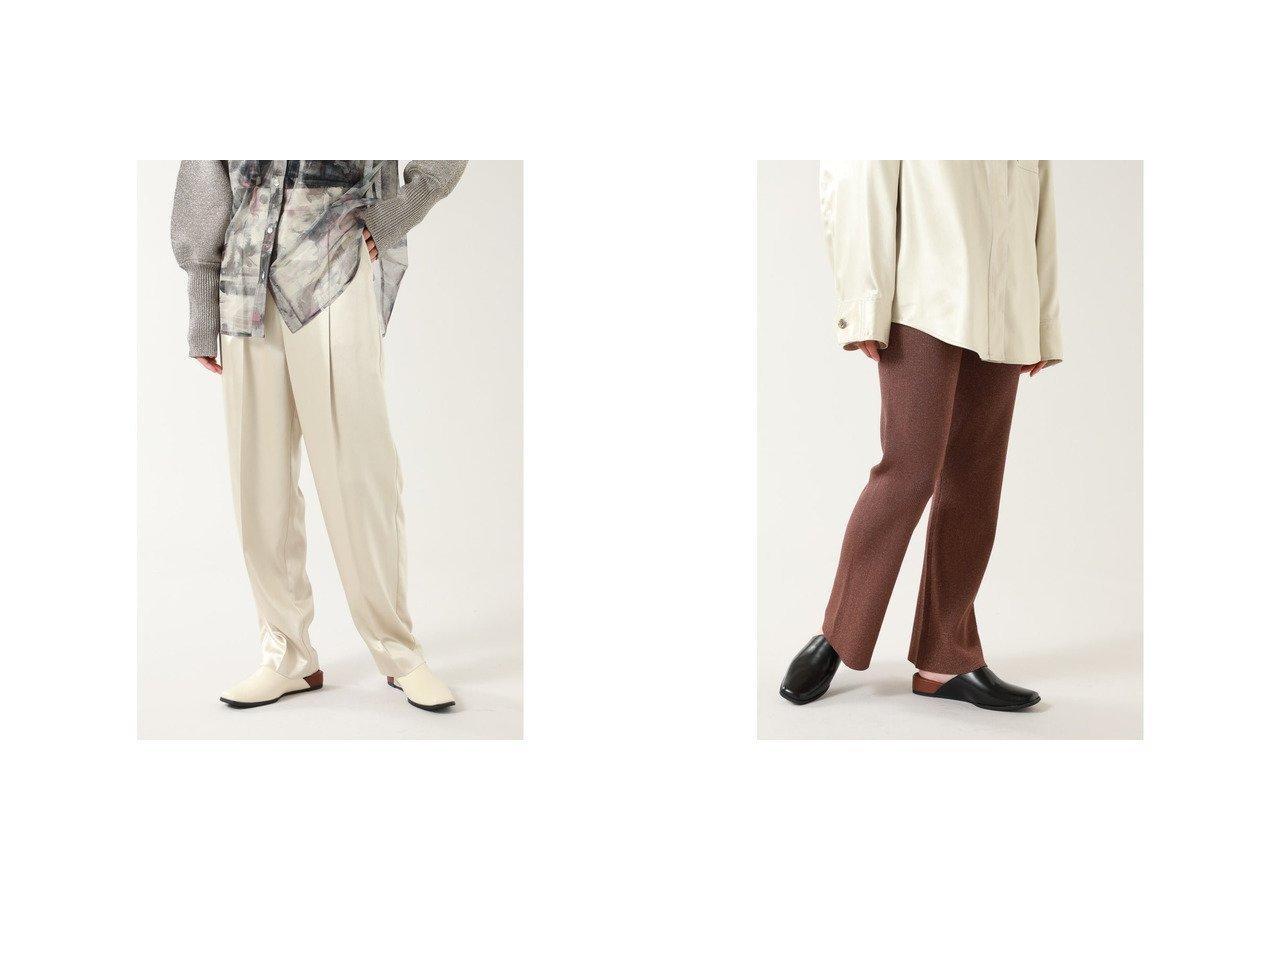 【ROSE BUD/ローズバッド】のレザーライクサテンパンツ&ラメニットパンツ ROSE BUDのおすすめ!人気、トレンド・レディースファッションの通販 おすすめで人気の流行・トレンド、ファッションの通販商品 メンズファッション・キッズファッション・インテリア・家具・レディースファッション・服の通販 founy(ファニー) https://founy.com/ ファッション Fashion レディースファッション WOMEN パンツ Pants 春 Spring サテン シューズ スタンダード スニーカー テーパード ドレープ マニッシュ 2021年 2021 S/S 春夏 SS Spring/Summer 2021 春夏 S/S SS Spring/Summer 2021 |ID:crp329100000018481